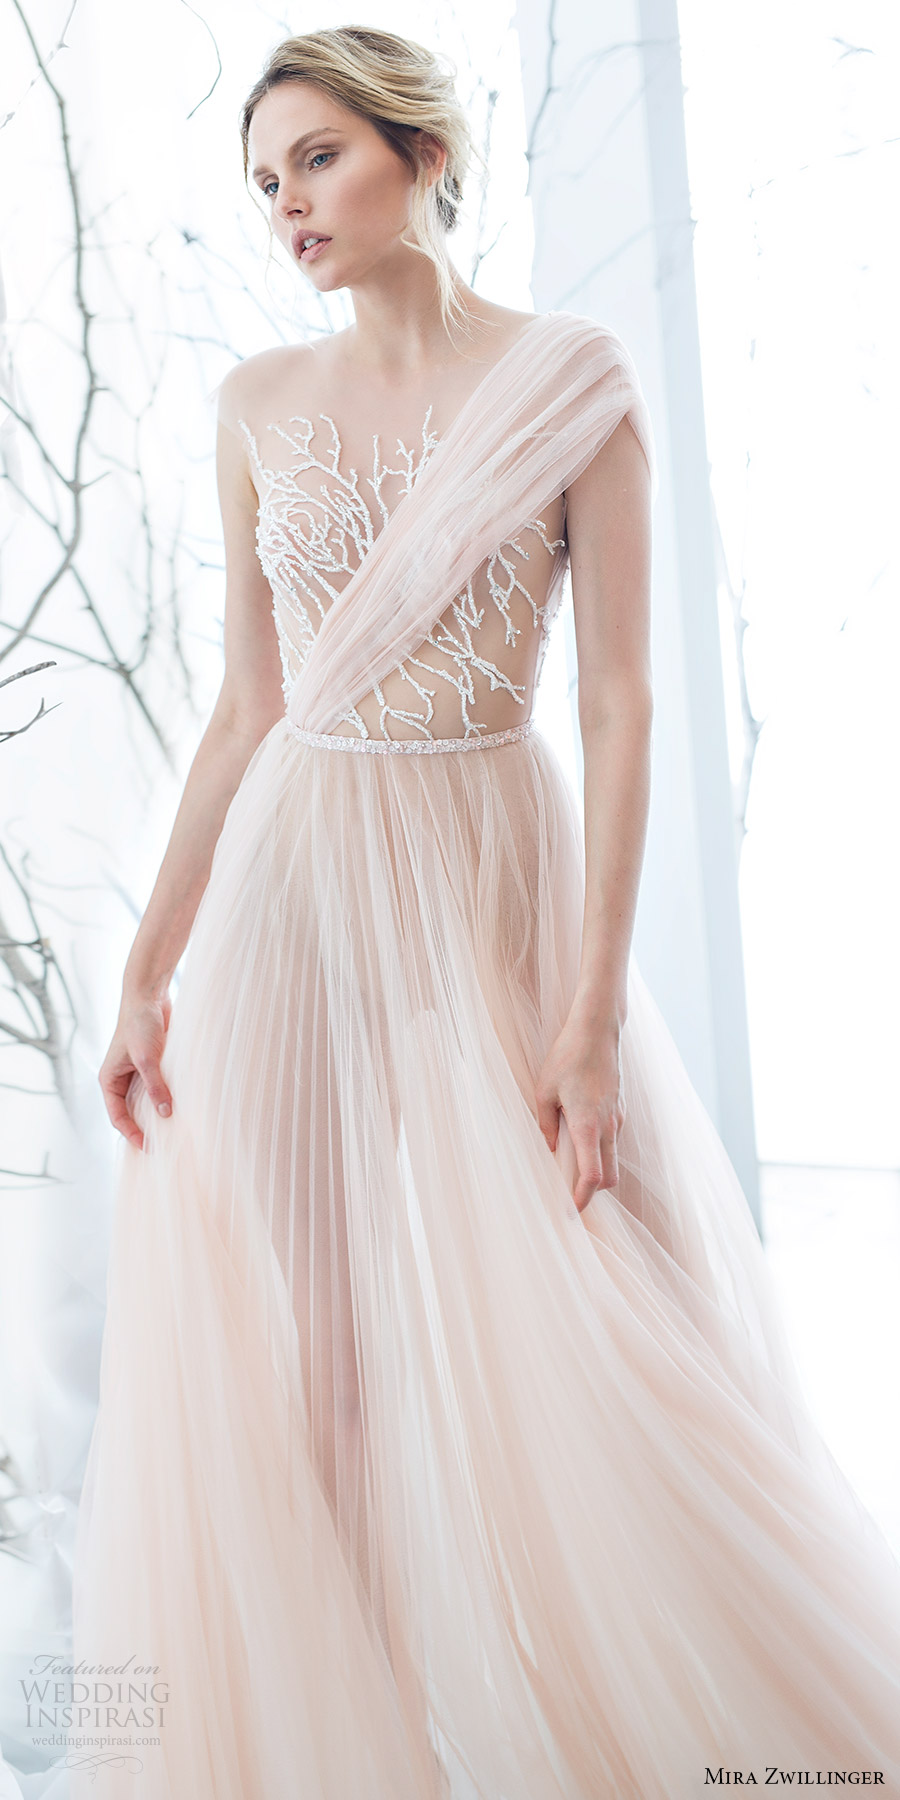 mira zwillinger bridal 2017 illusion cap sleeves illusion bodice aline wedding dress (mimosa) mv